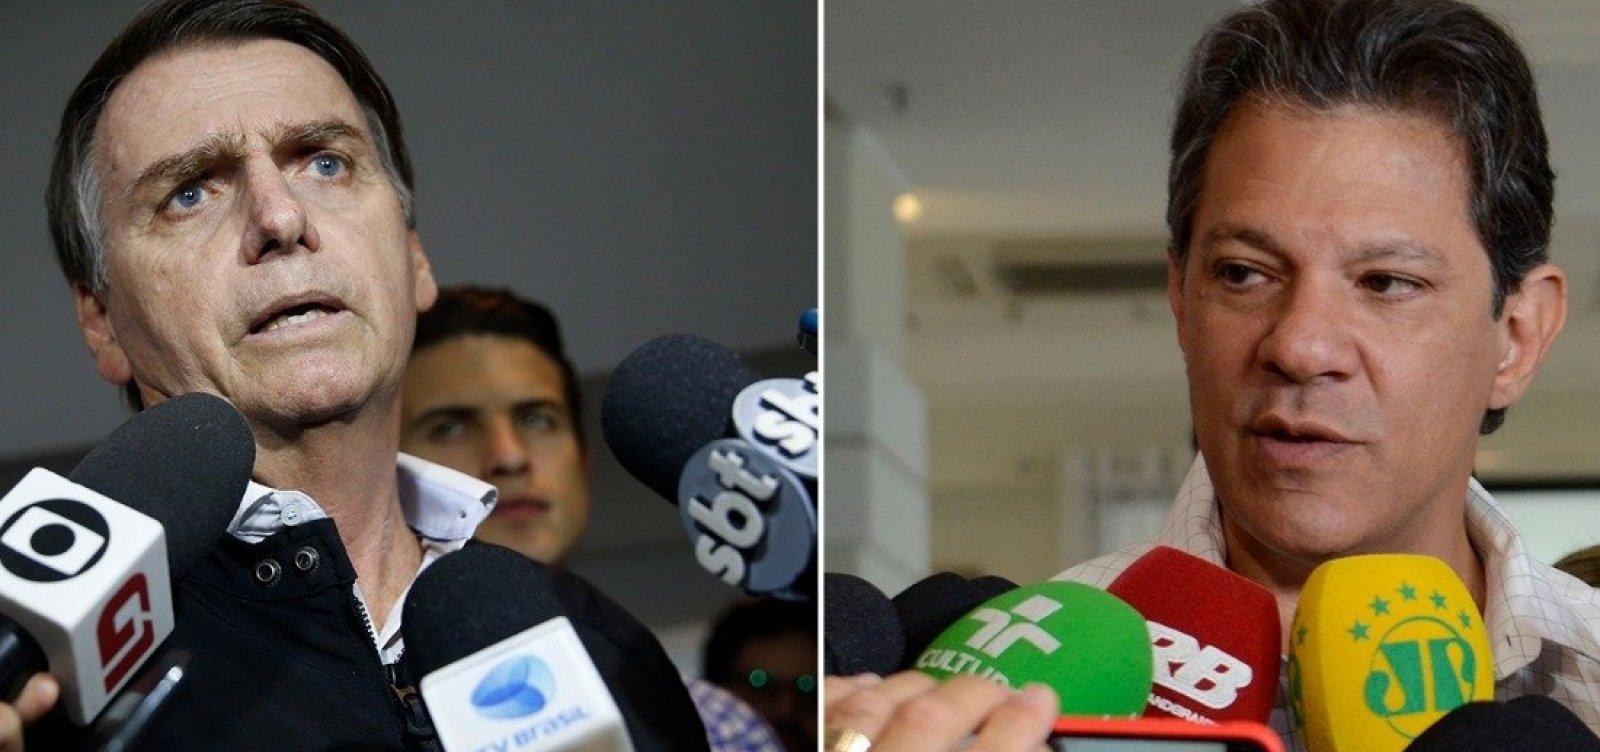 Haddad ultrapassa Bolsonaro na cidade de São Paulo, aponta Ibope